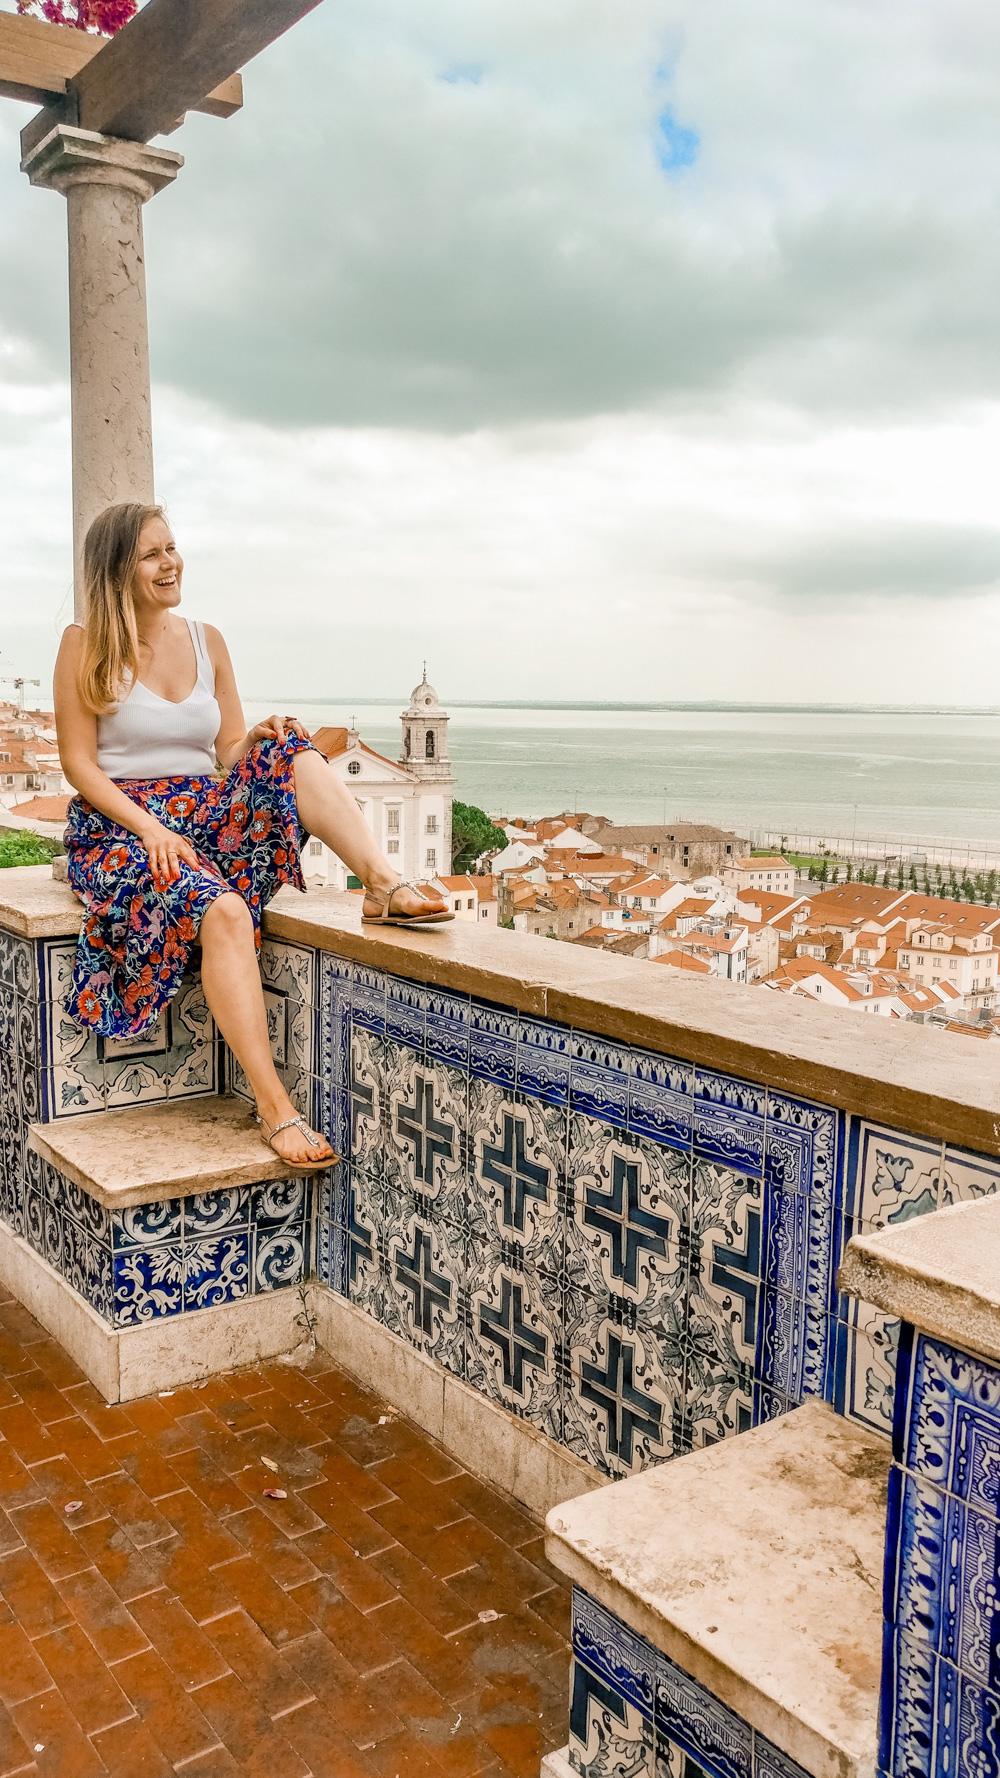 Miradouro de Santa Luzia - Visit Lisbon's best viewpoints - 5 things you need to experience in Lisbon, Portugal | Aliz's Wonderland